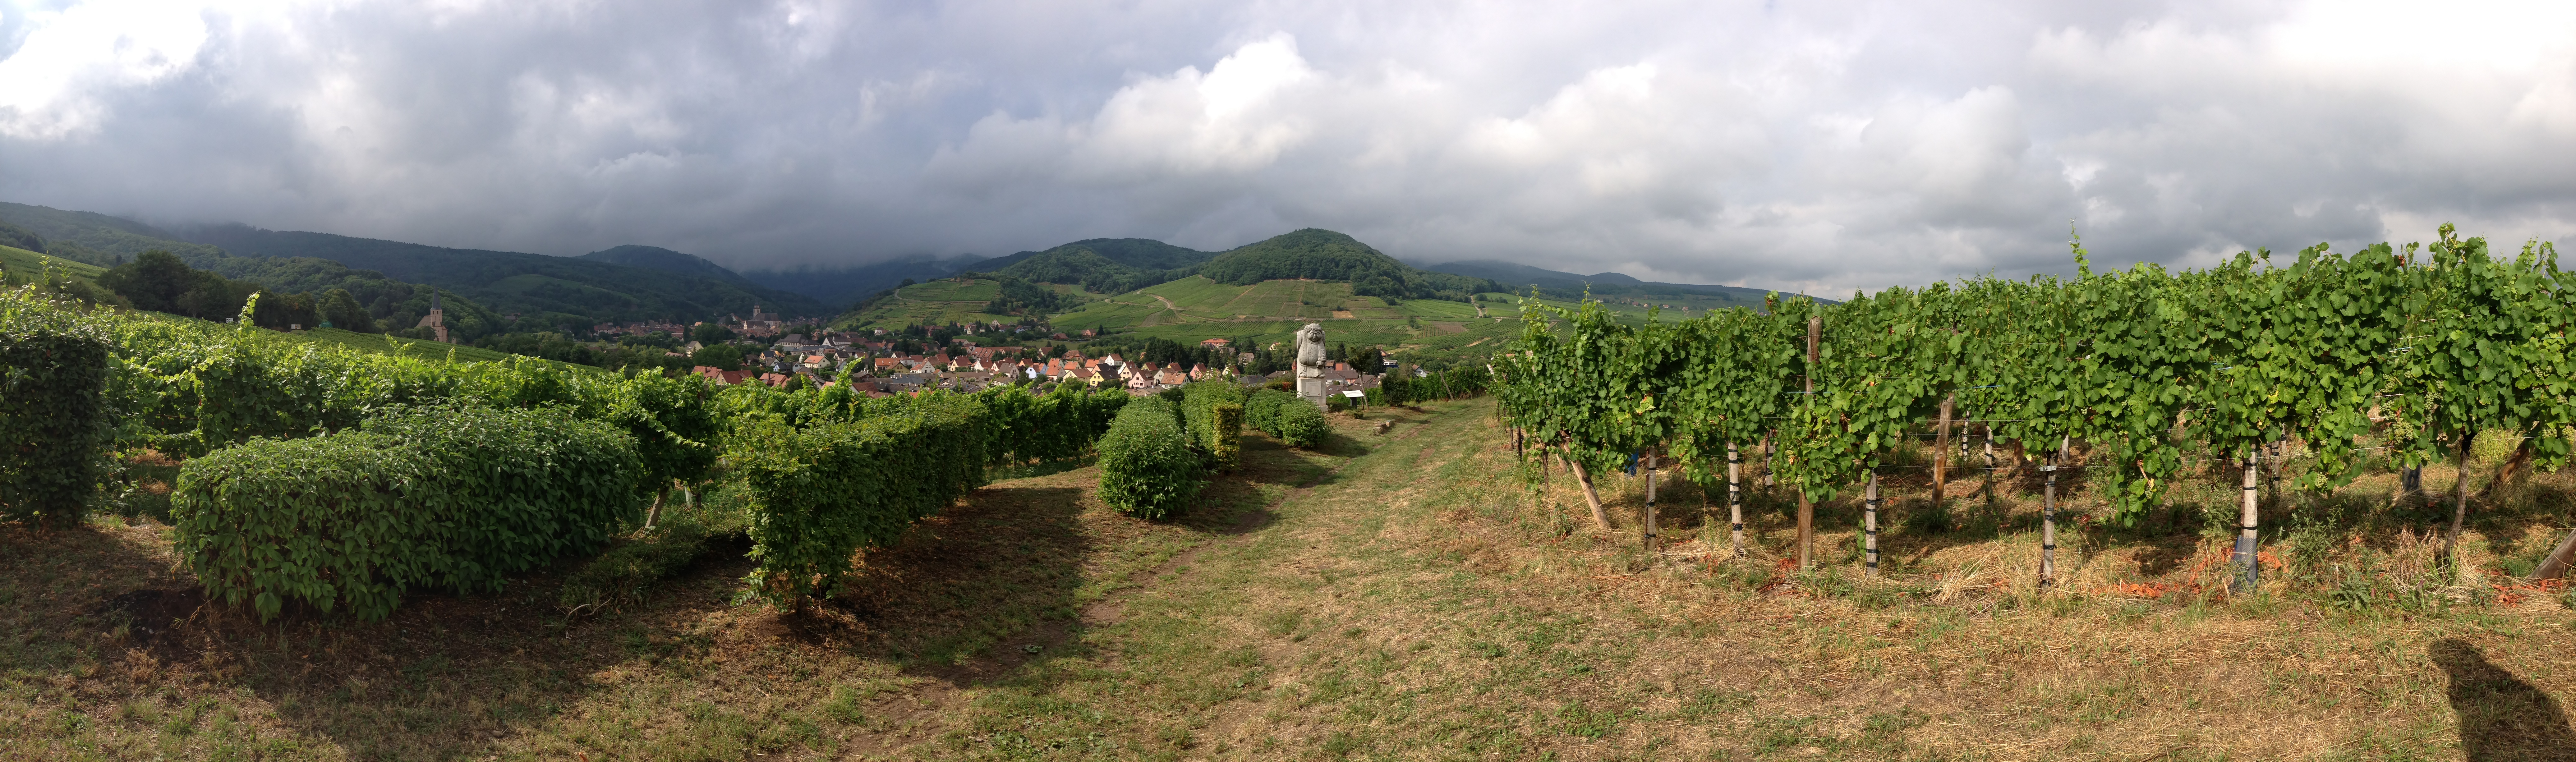 Route de vin in Alsace